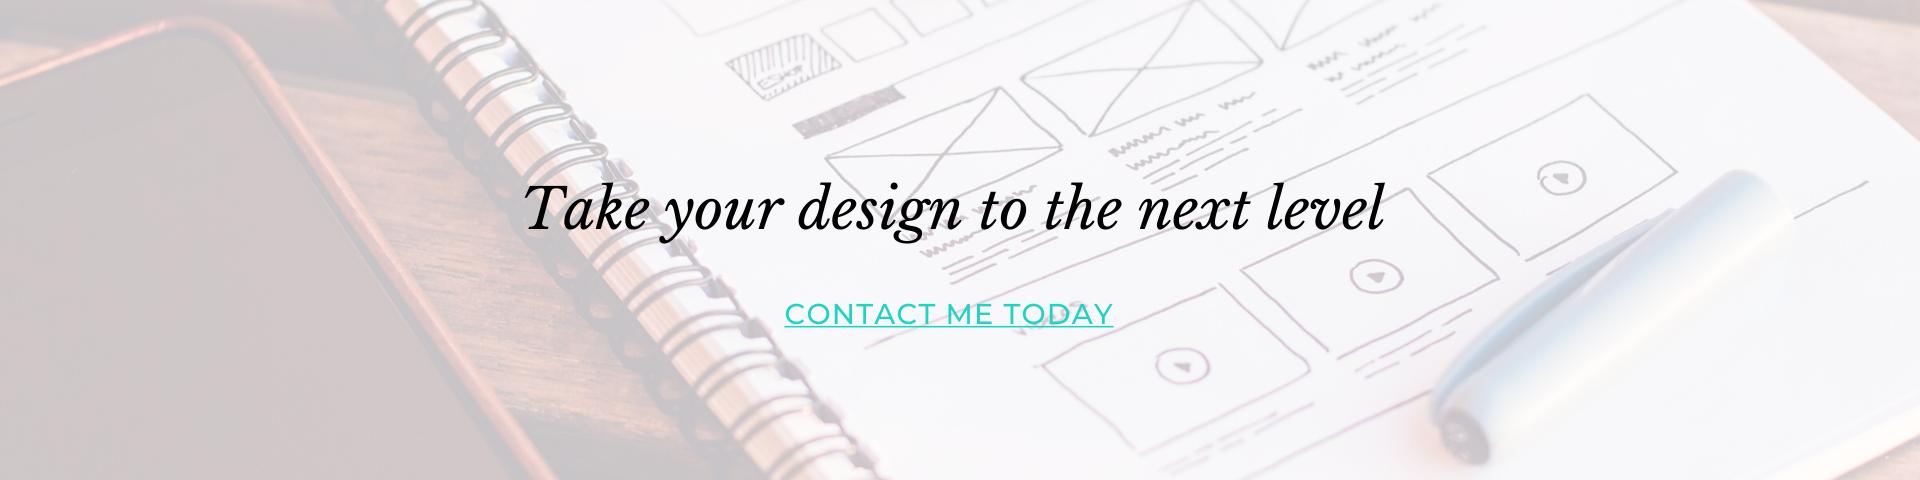 web design cta header blog